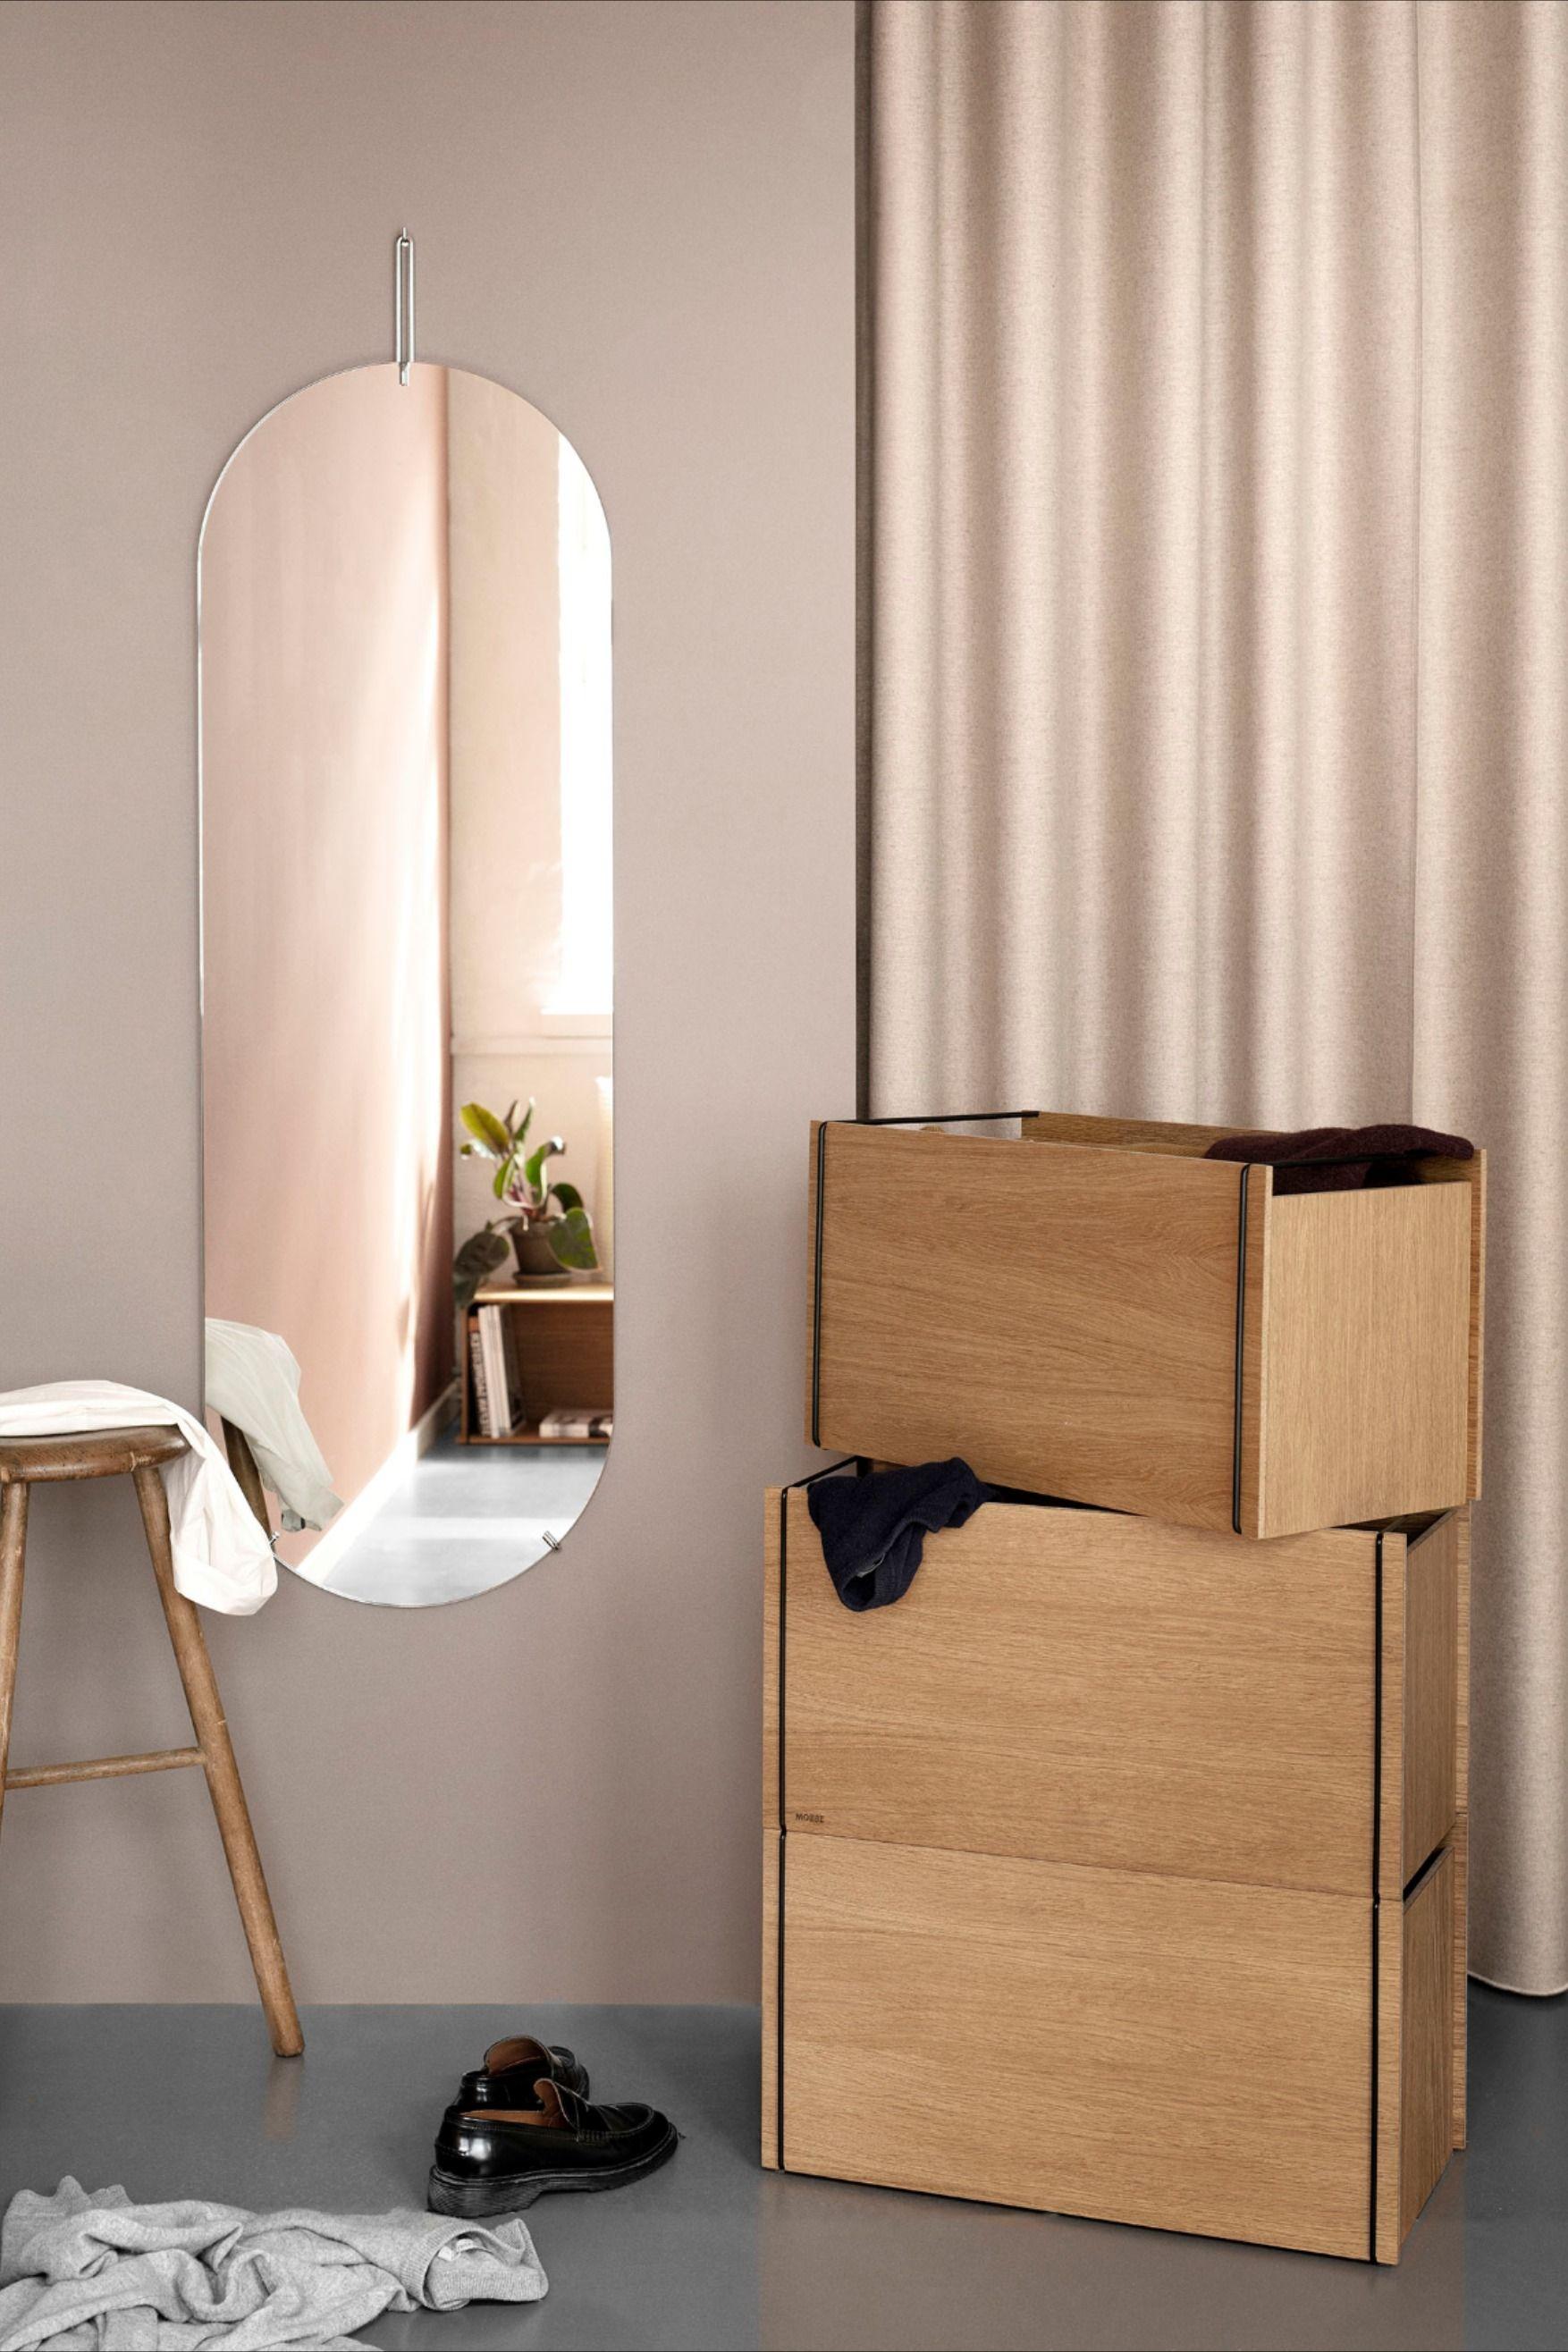 Storage Box In 2020 Storage Box Danish Design Beautiful Storage #storage #box #living #room